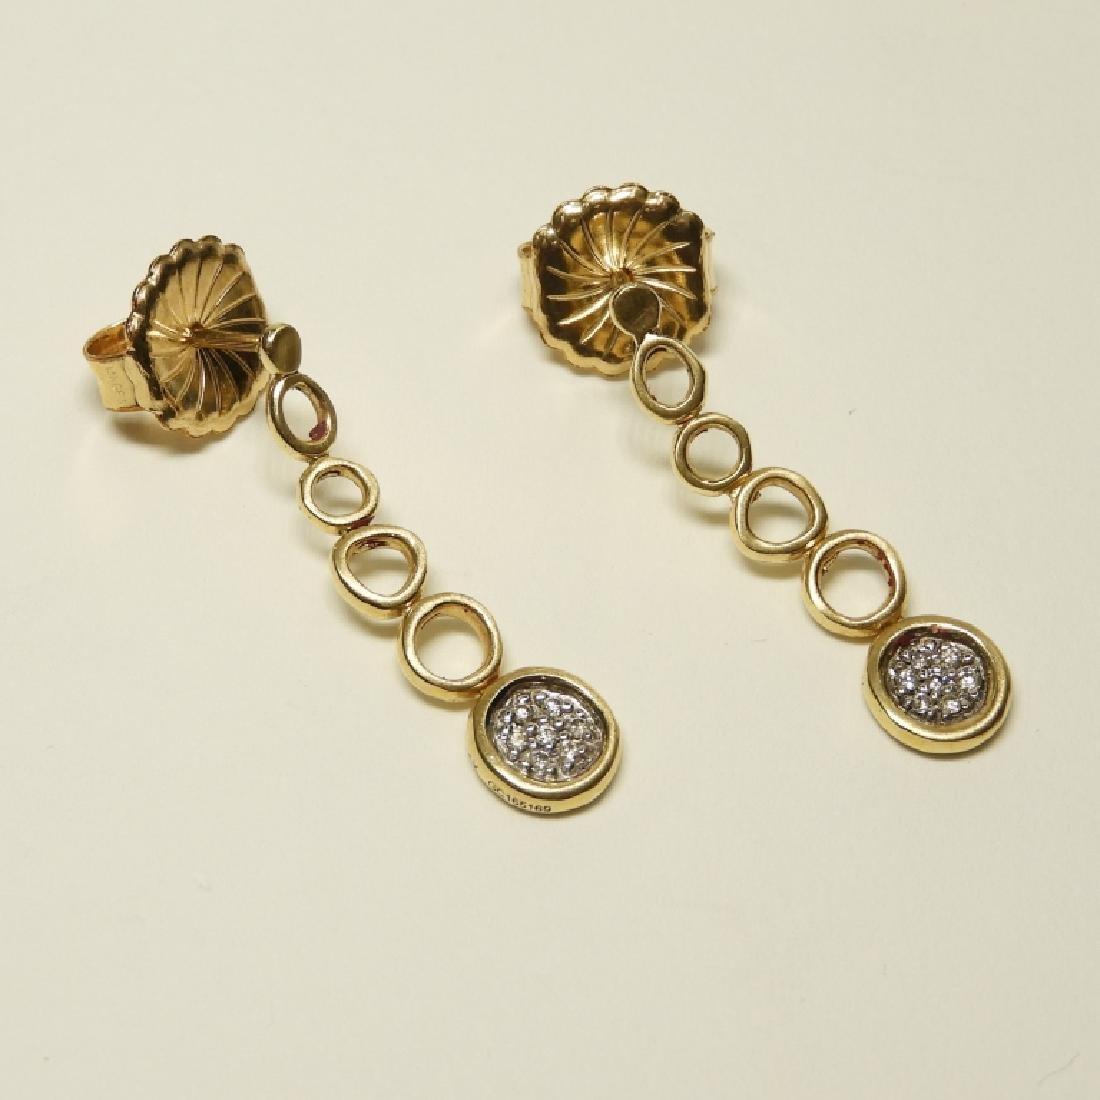 2 Pair 14K Gold Earrings Diamonds Lapis Onyx - 3